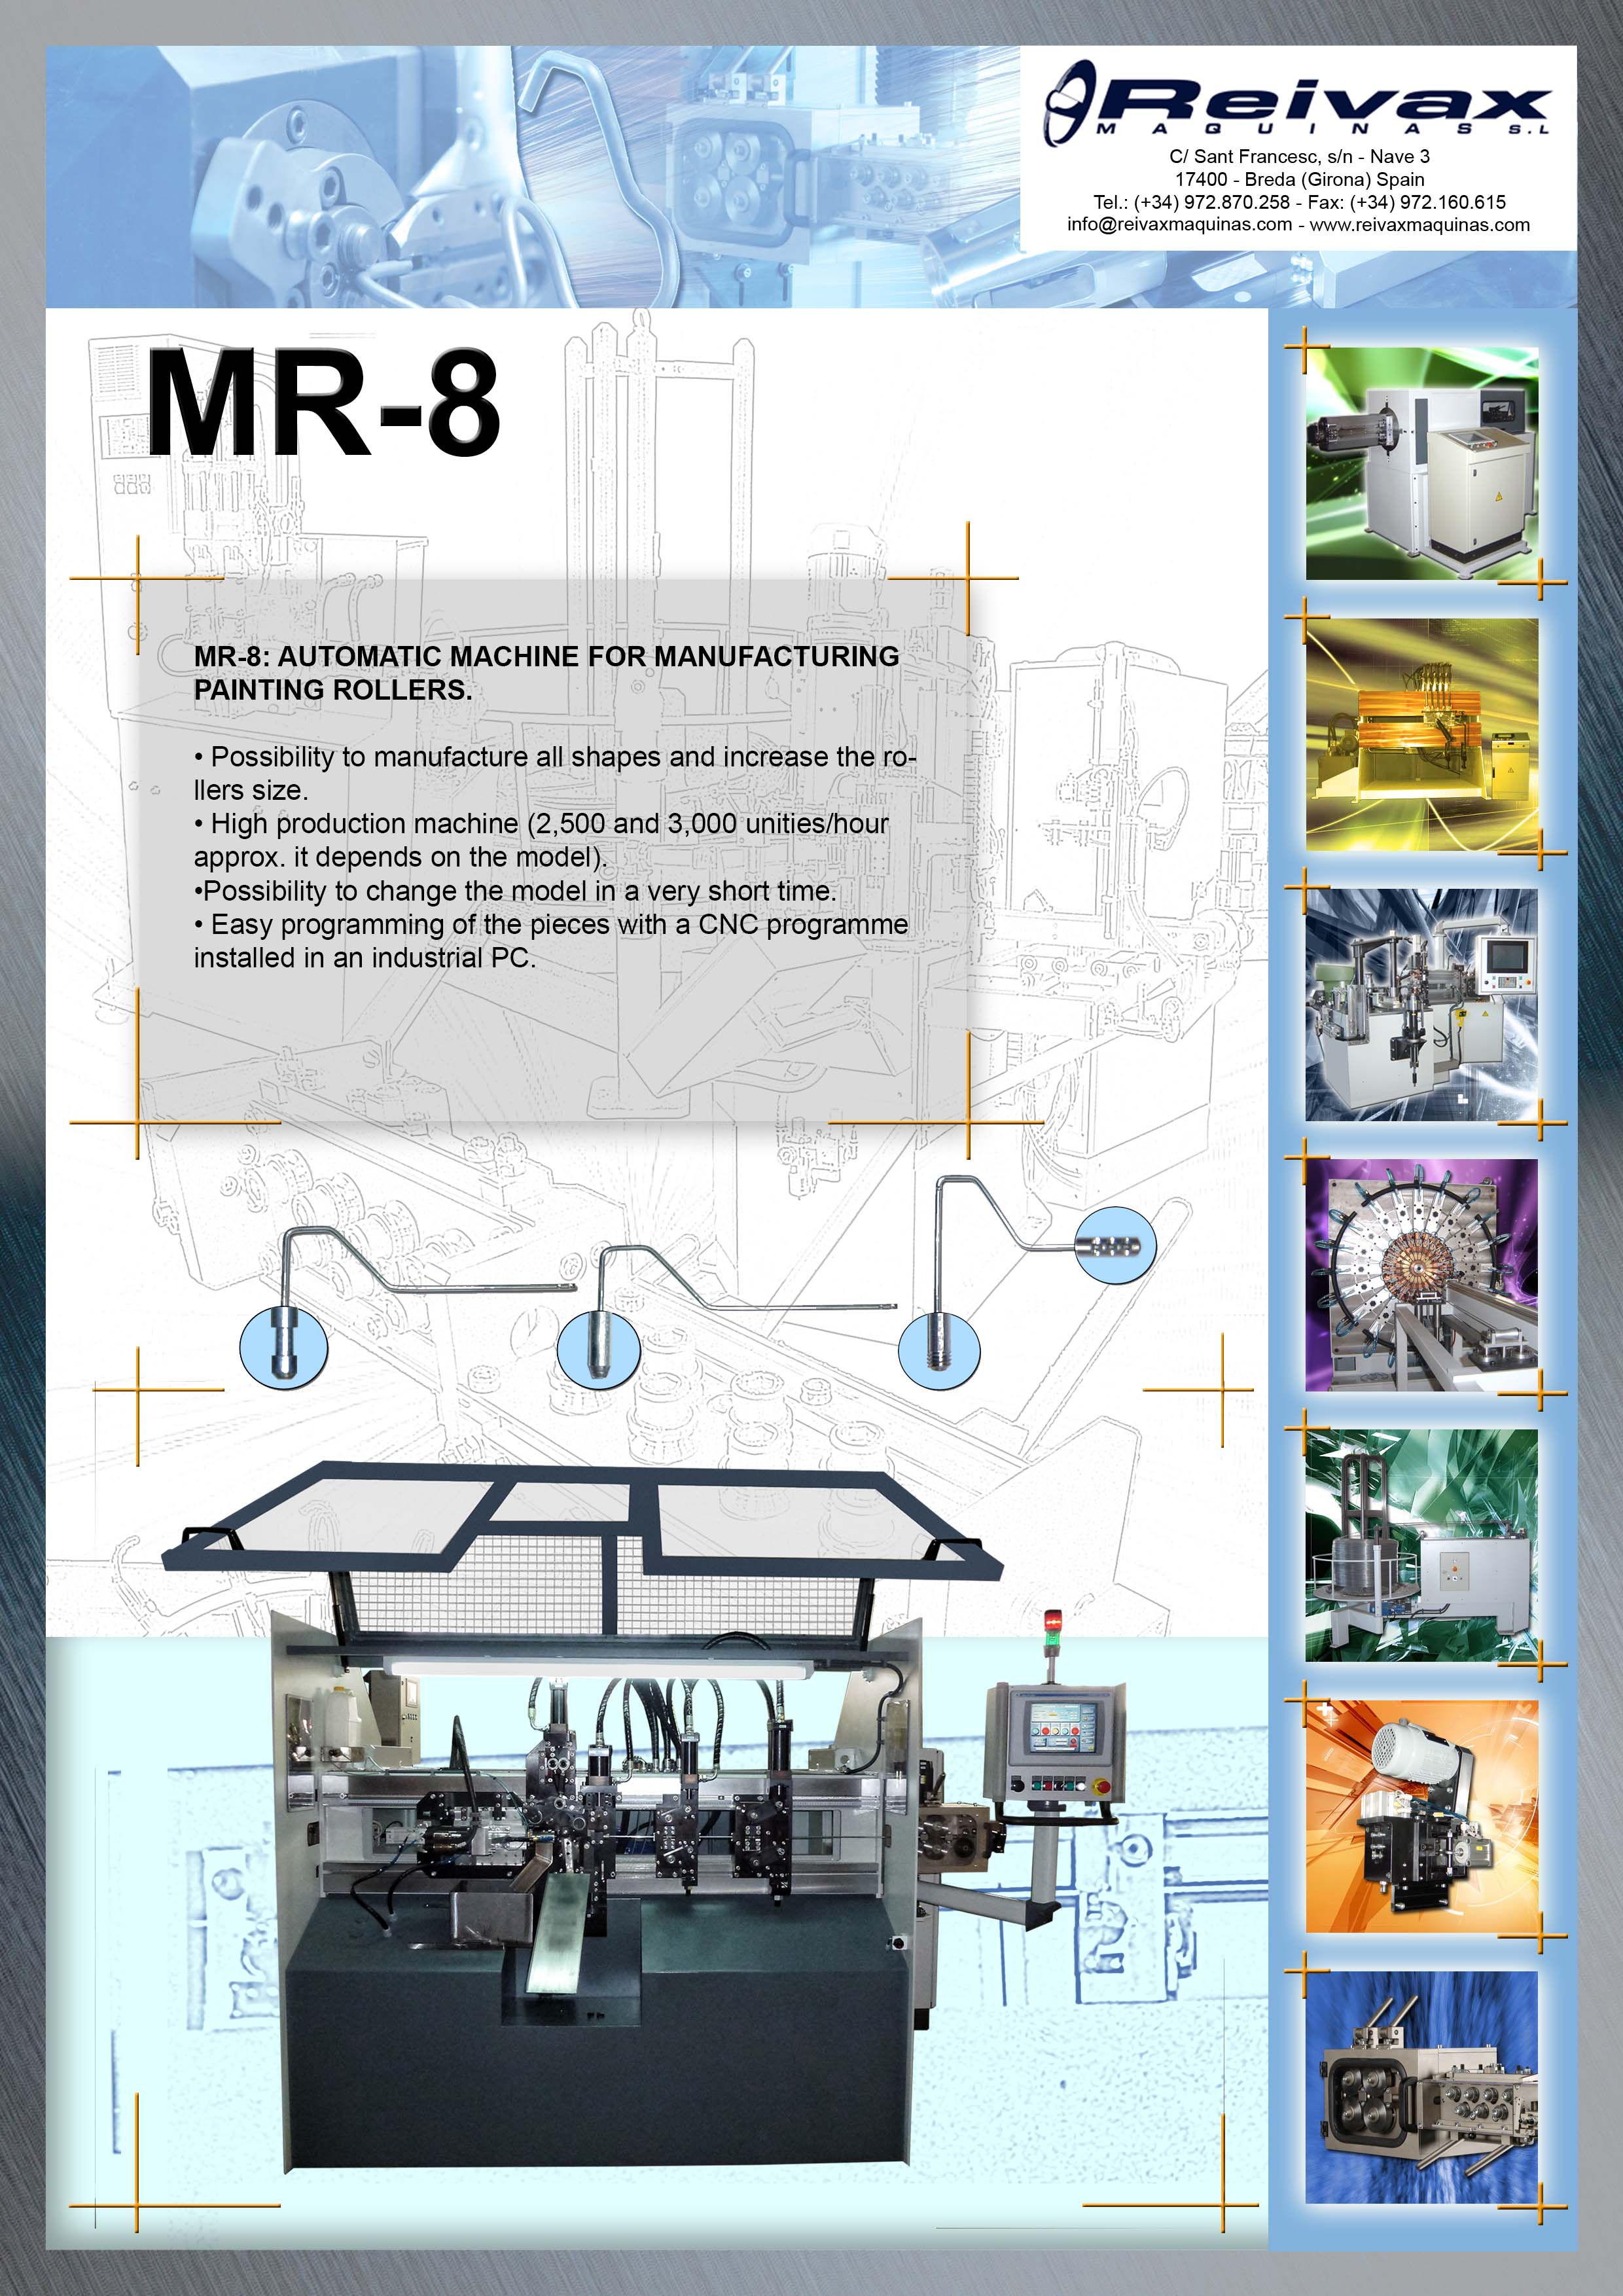 ReivaxMaquinas: Technical Details MR-8